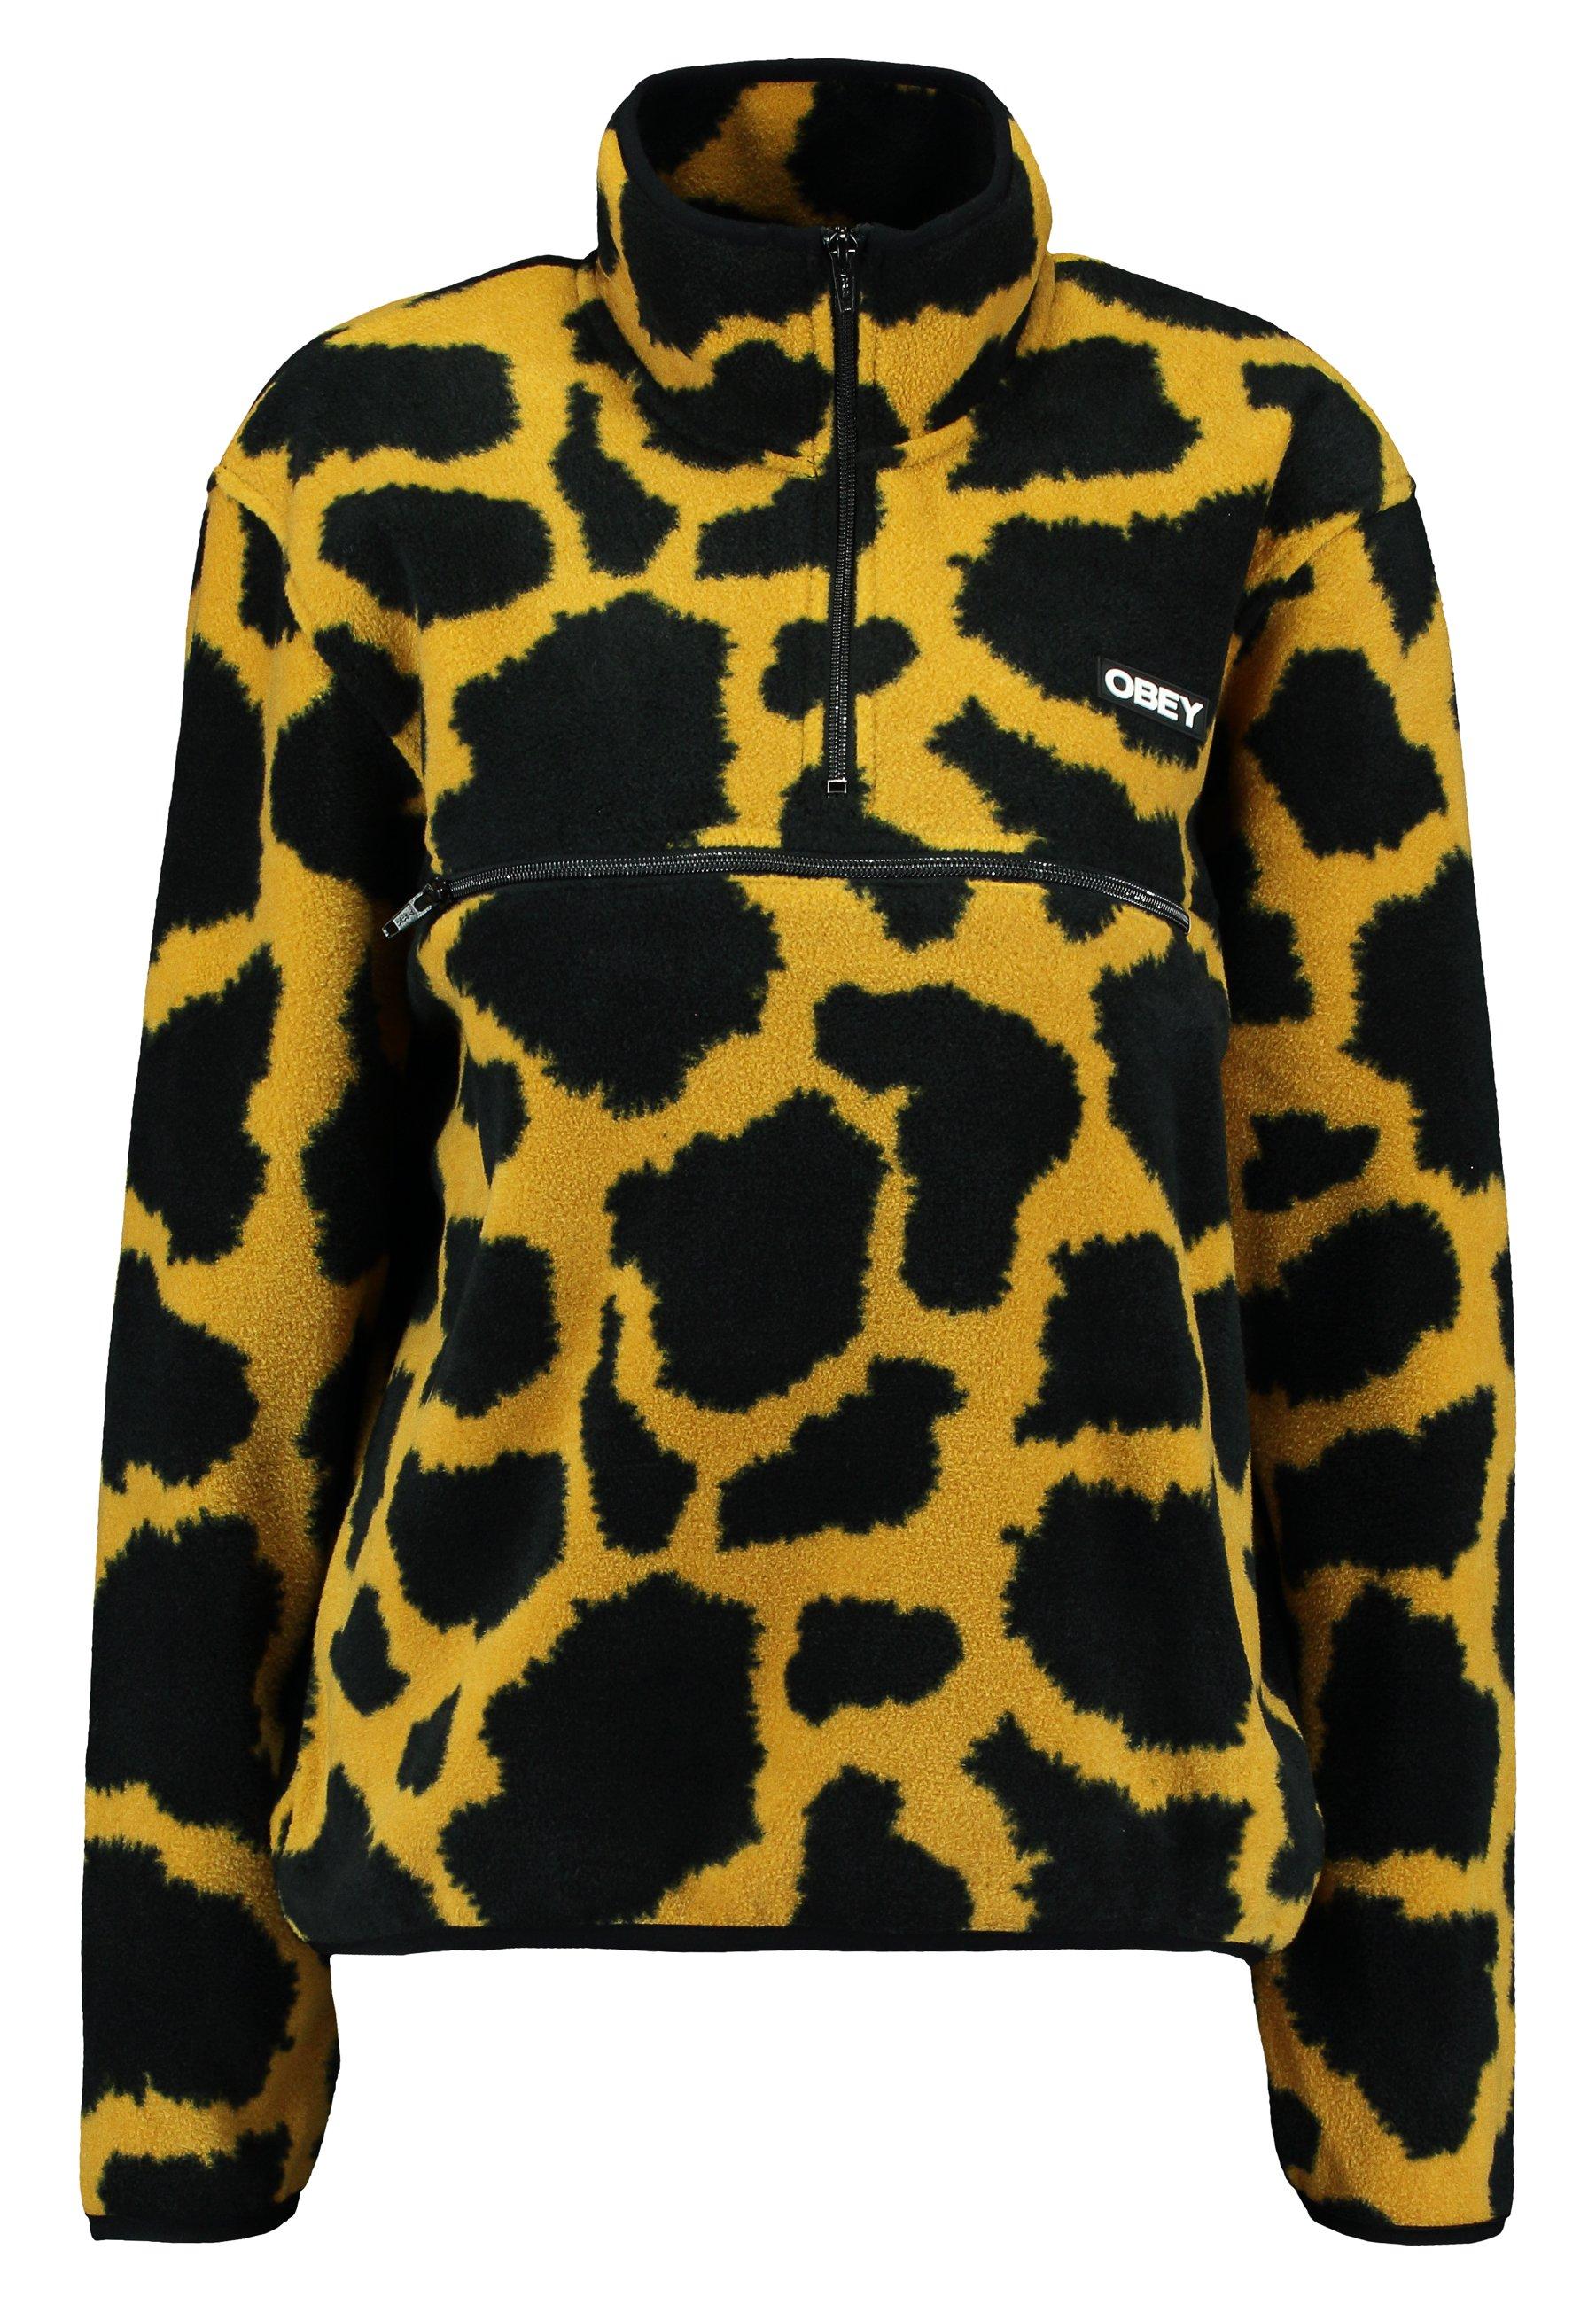 Obey Clothing ODYSSEY Sweatshirt yellow Zalando.at